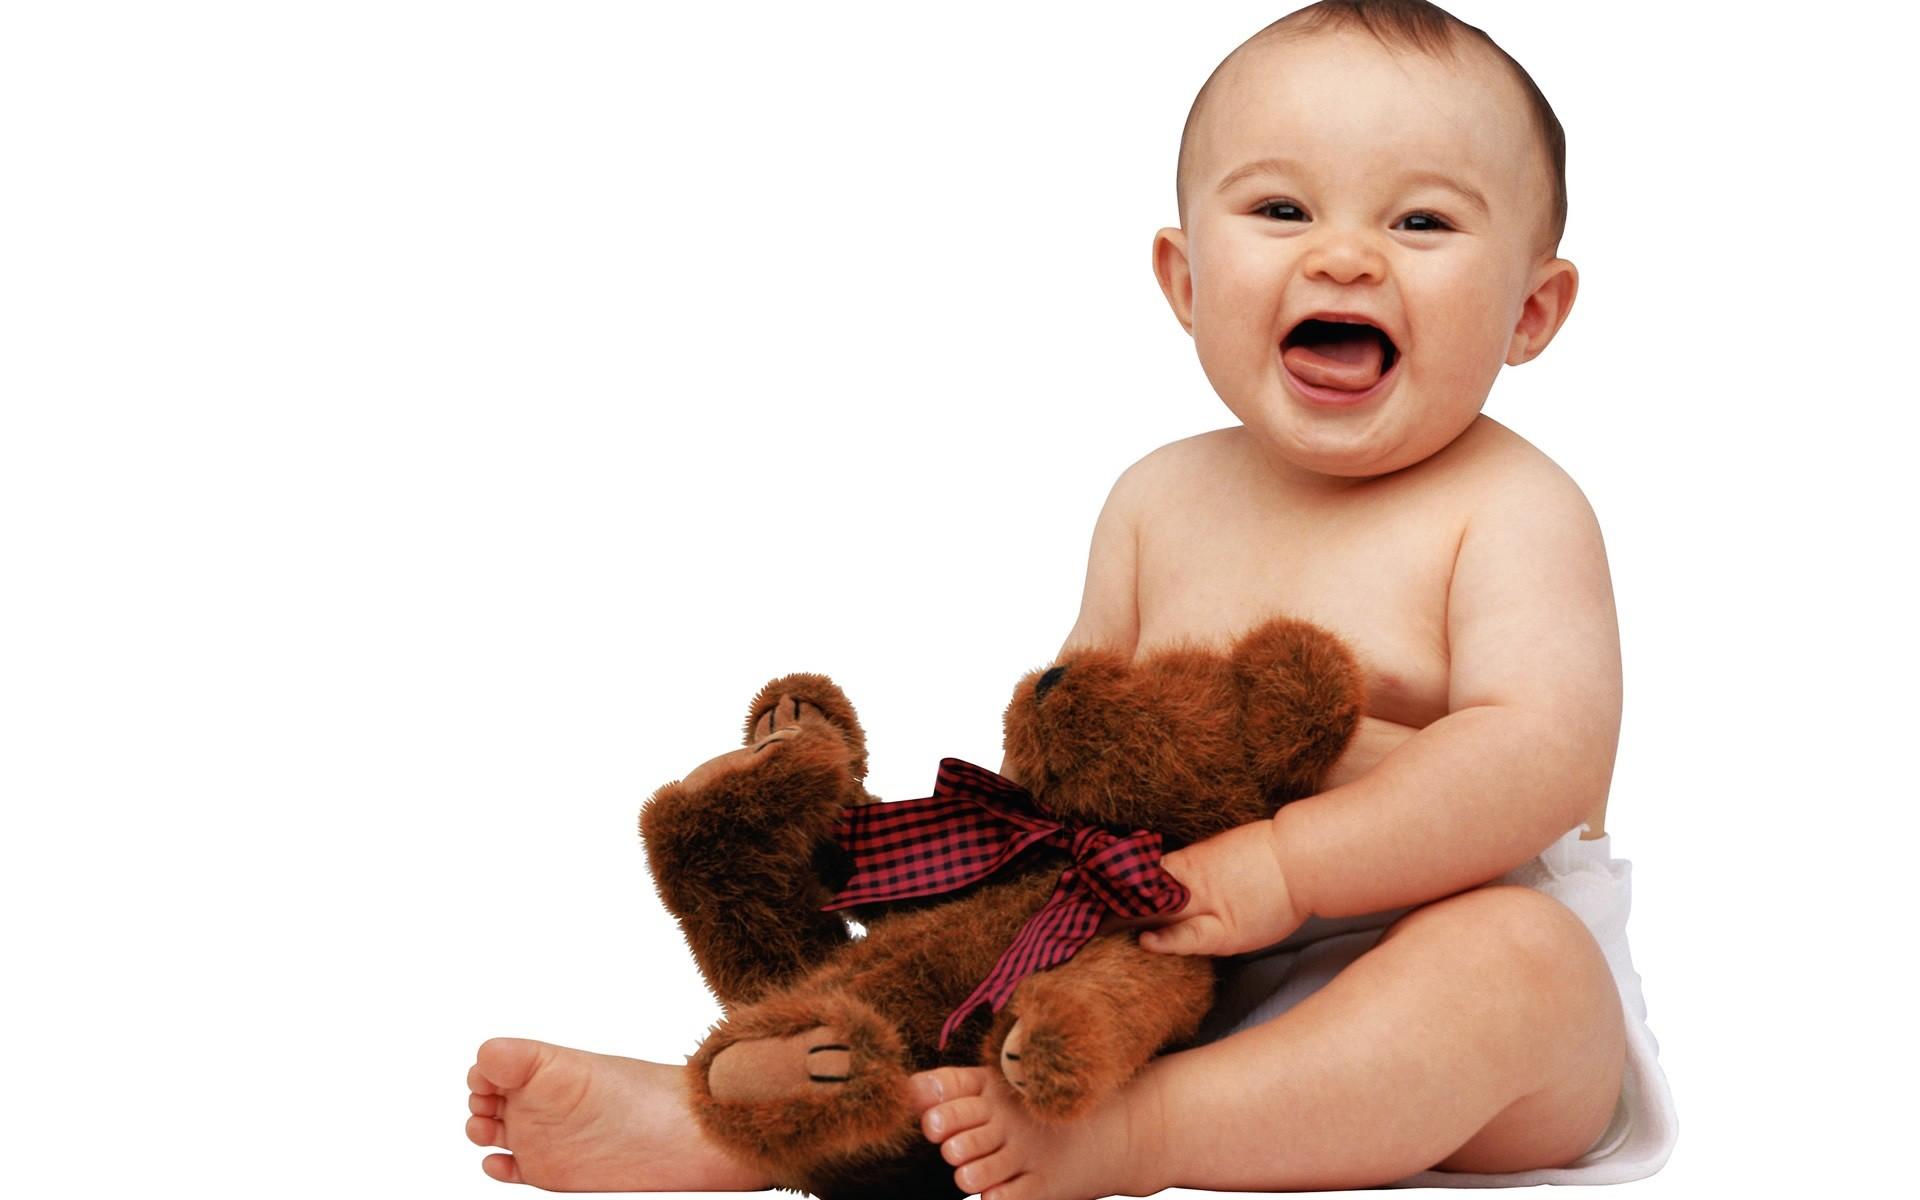 Super Cute Little Baby Wallpapers: Find best latest Super Cute Little Baby  Wallpapers in HD